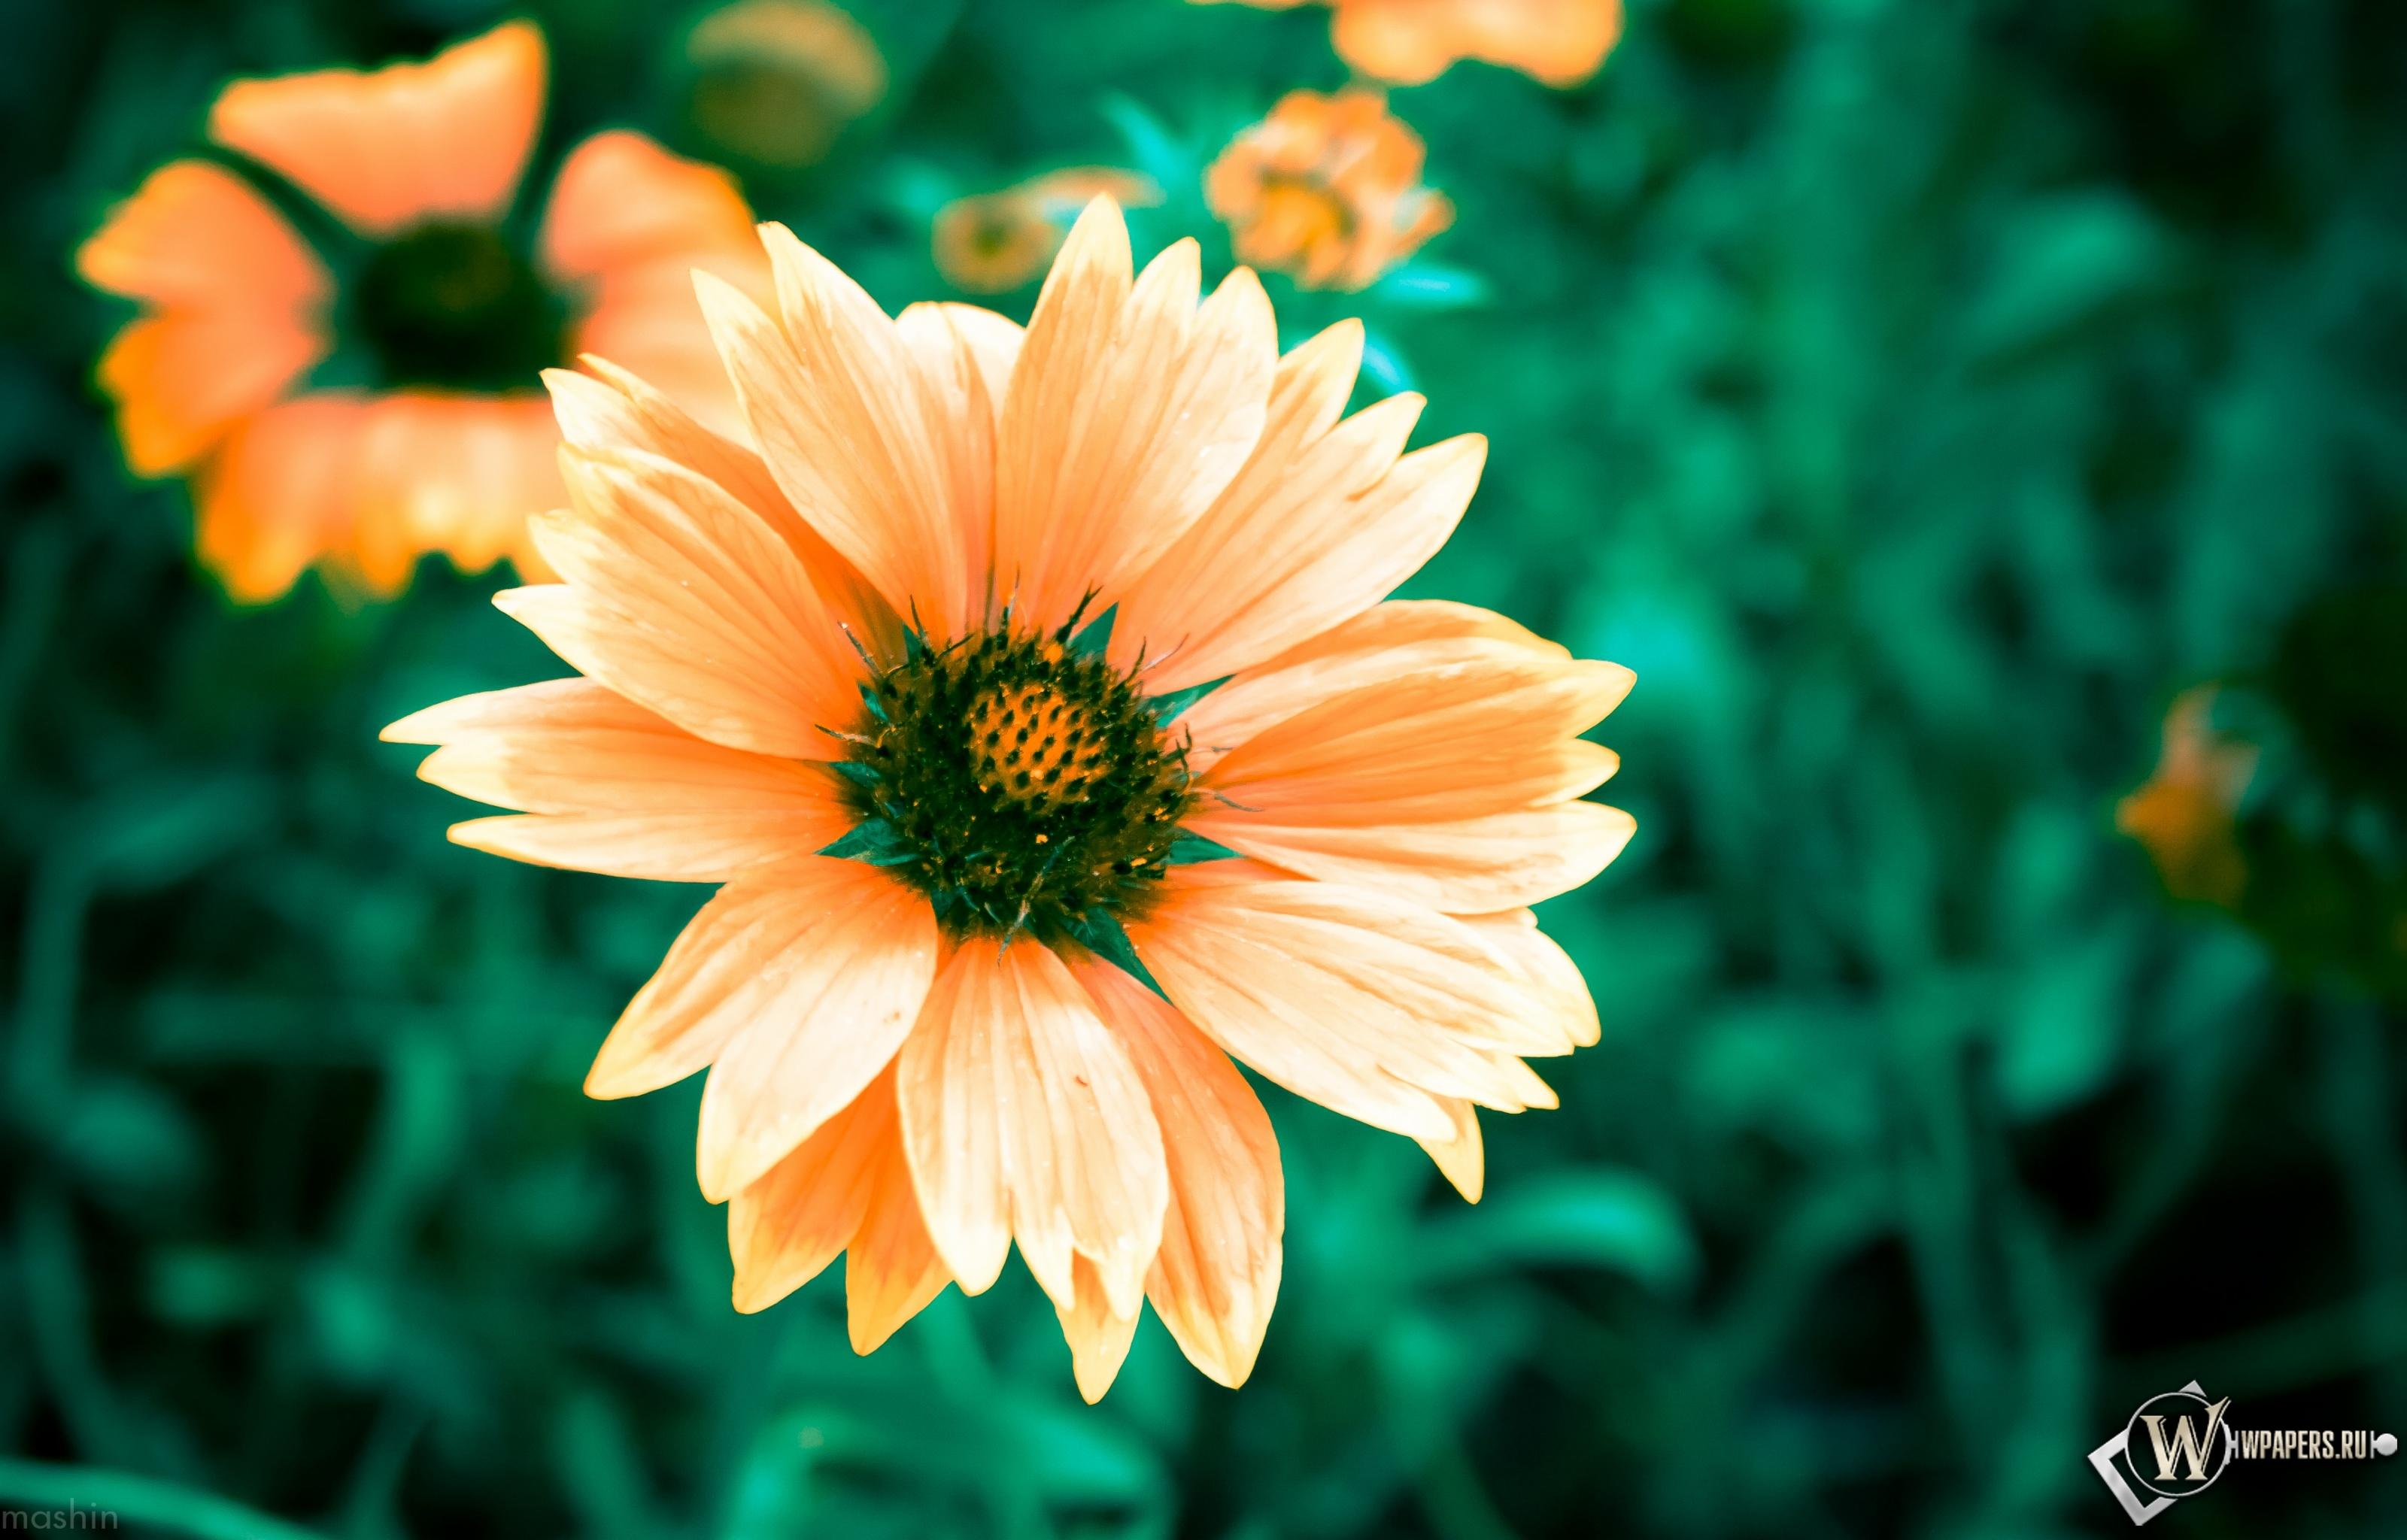 Теплый цветок 3200x2048